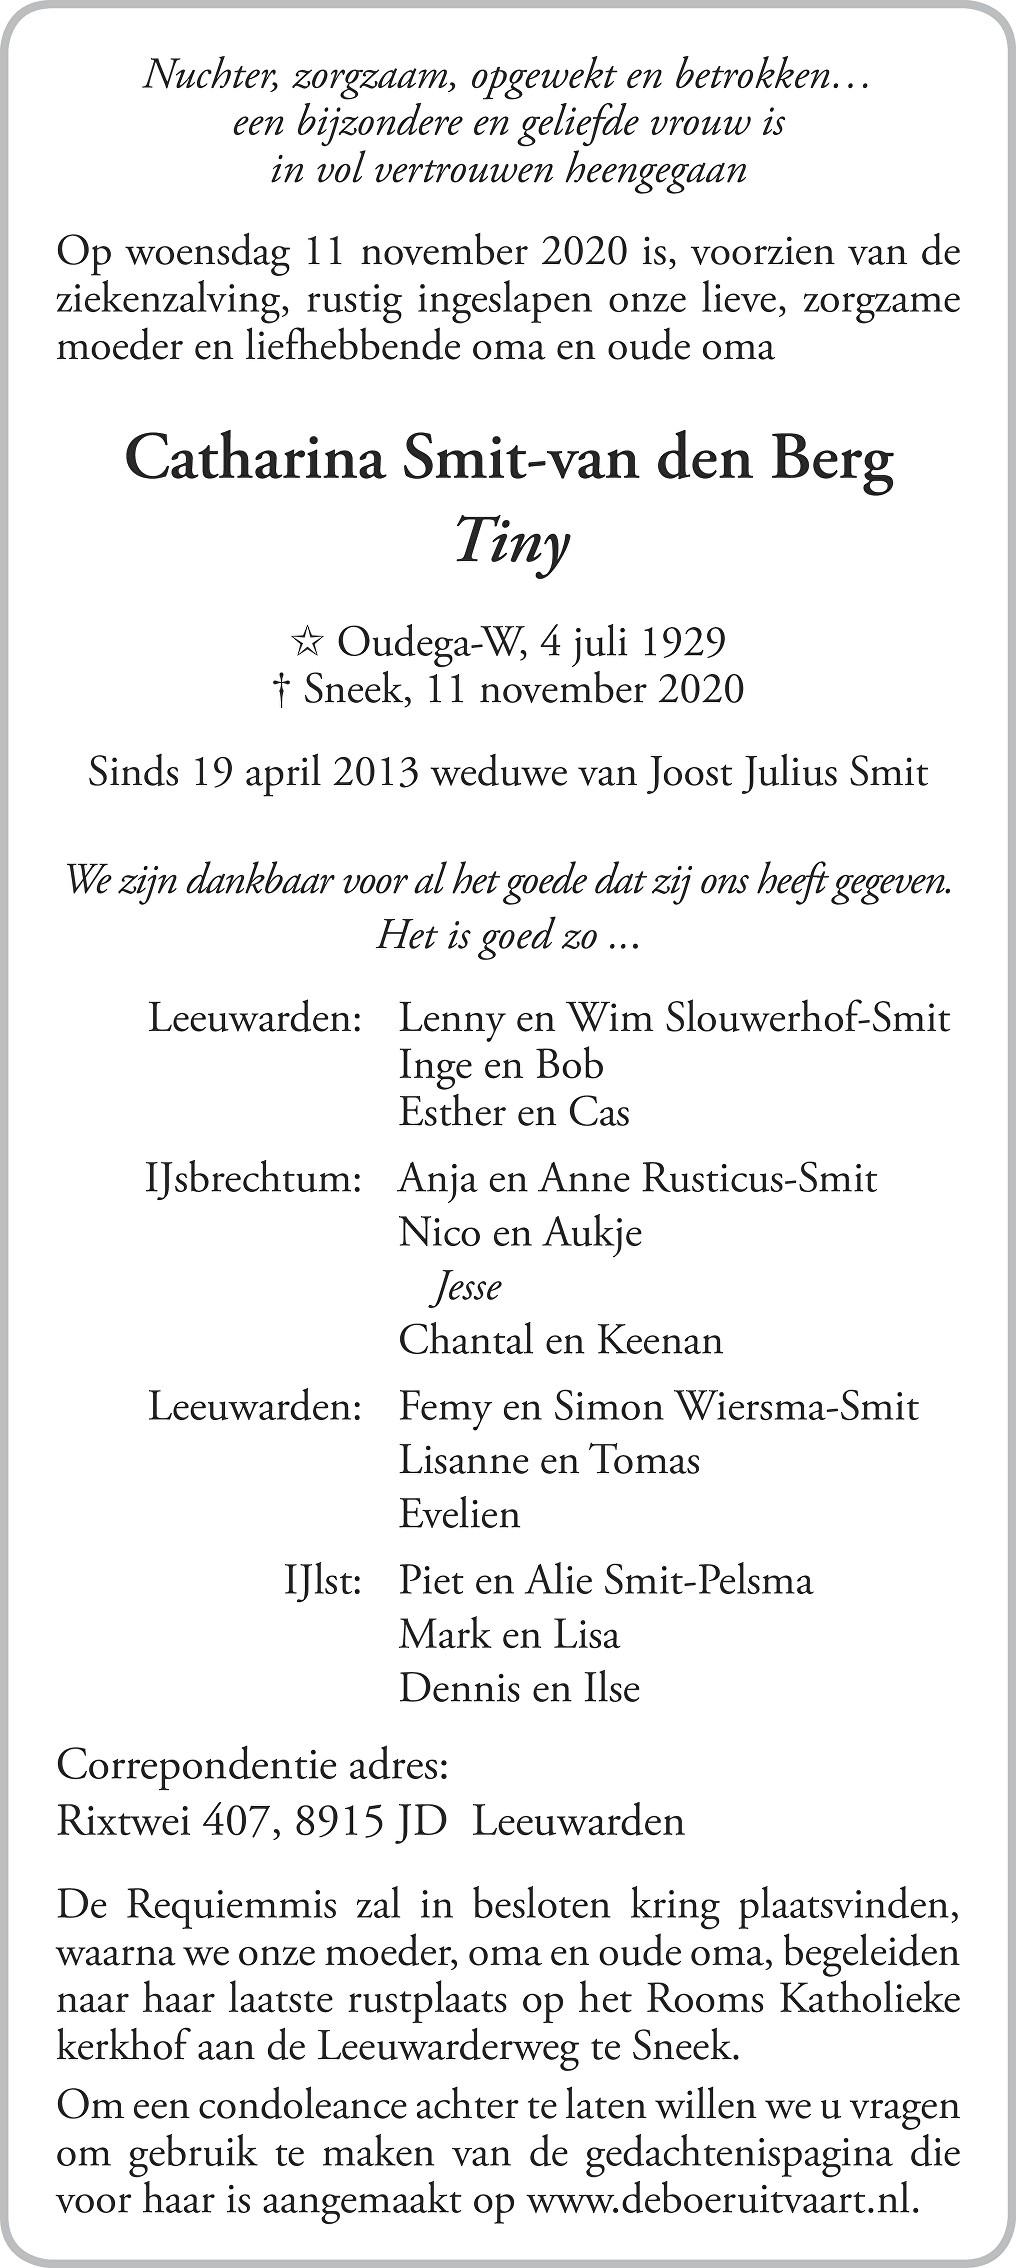 Catharina Smit-van den Berg Death notice